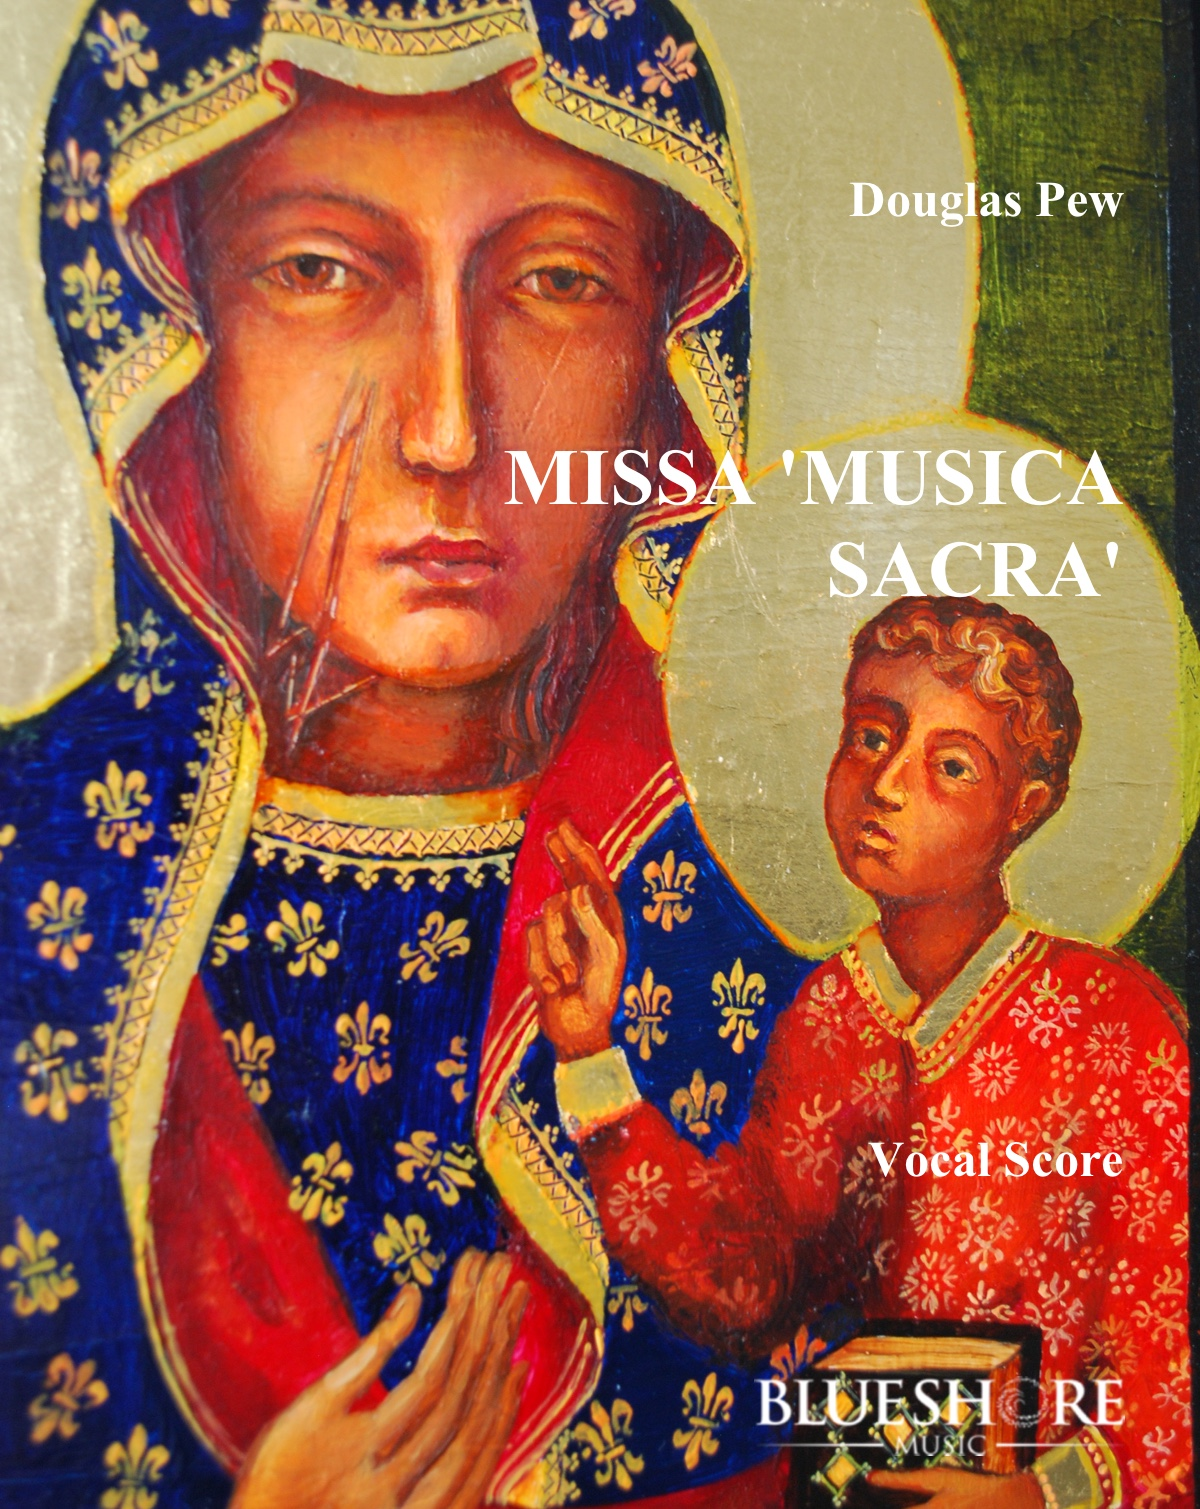 Missa 'Musica Sacra'   ,  for Mixed Chorus and Organ